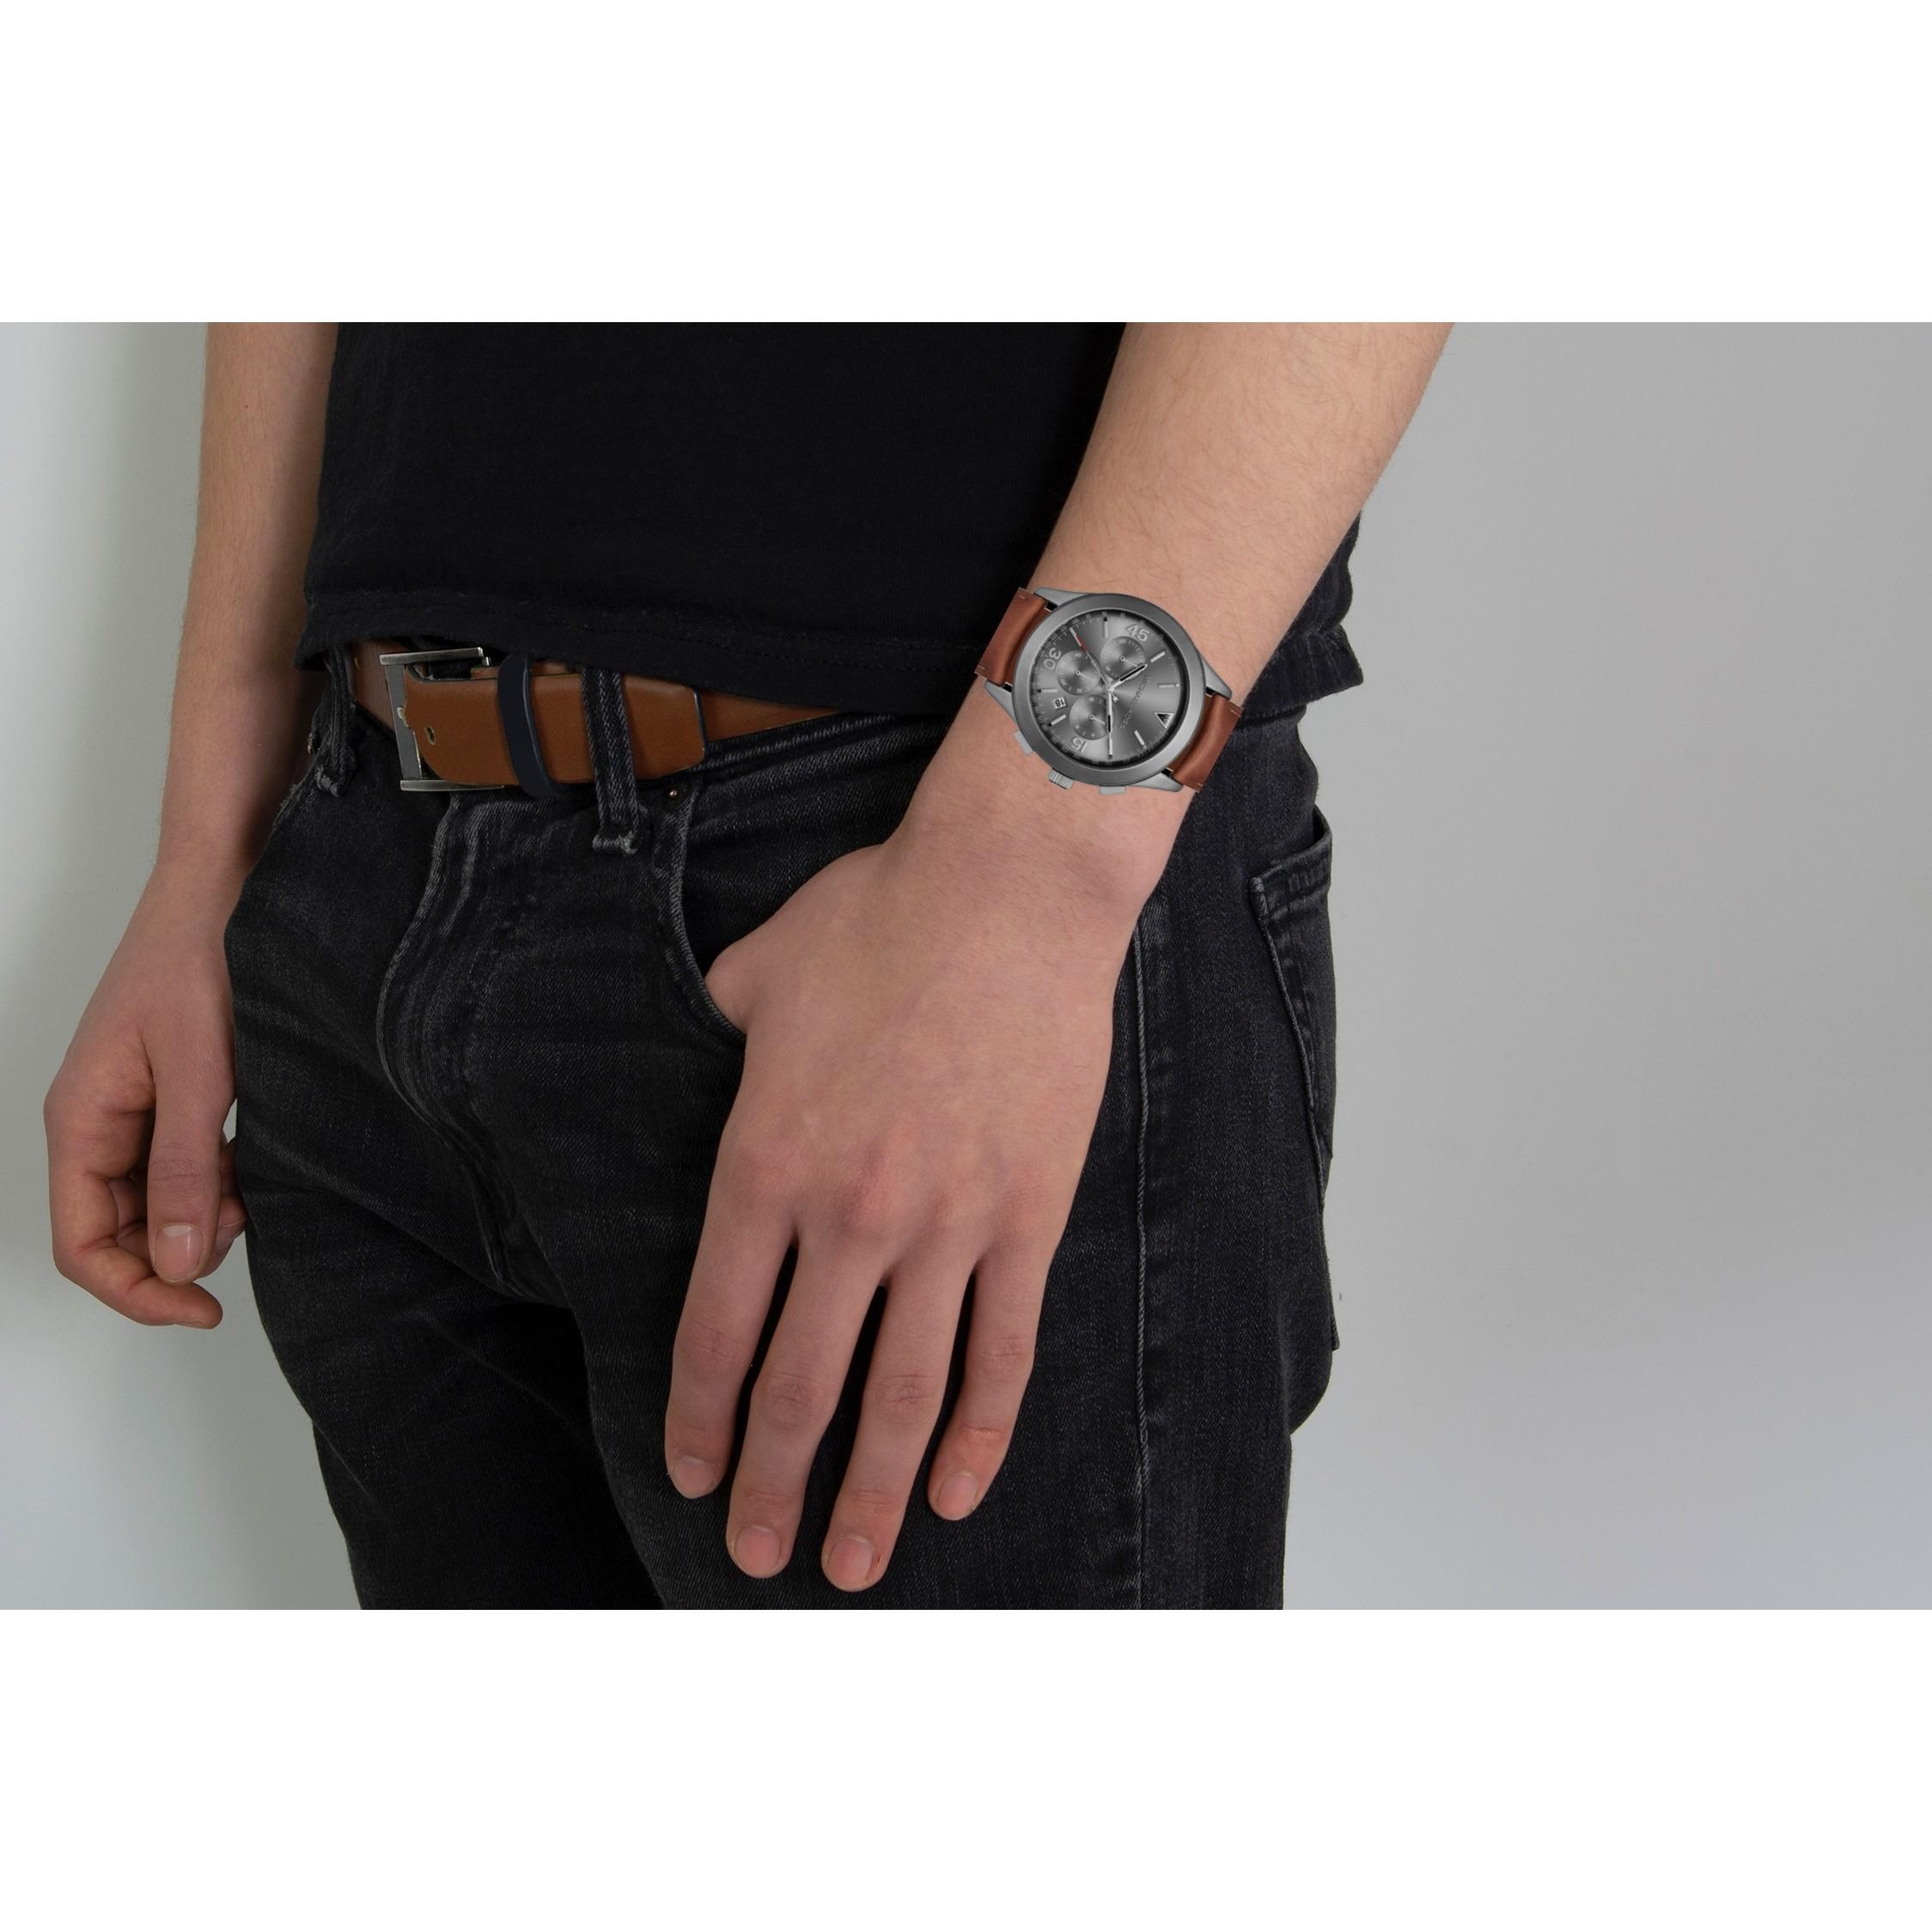 b9cb1759c420 Brown Leather MK8471 Michael Kors Watch